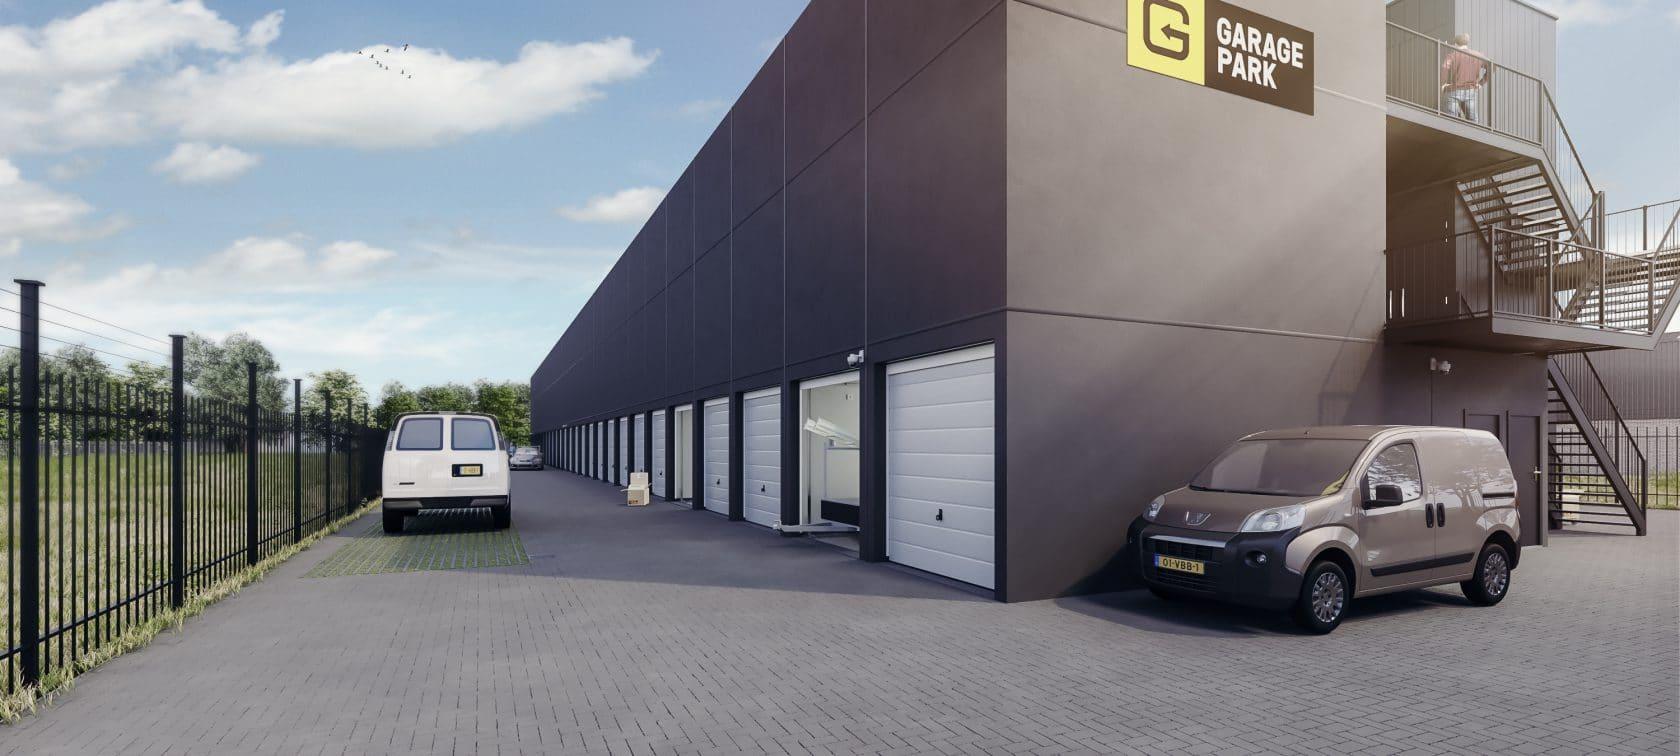 GaragePark Almere Gooisekant